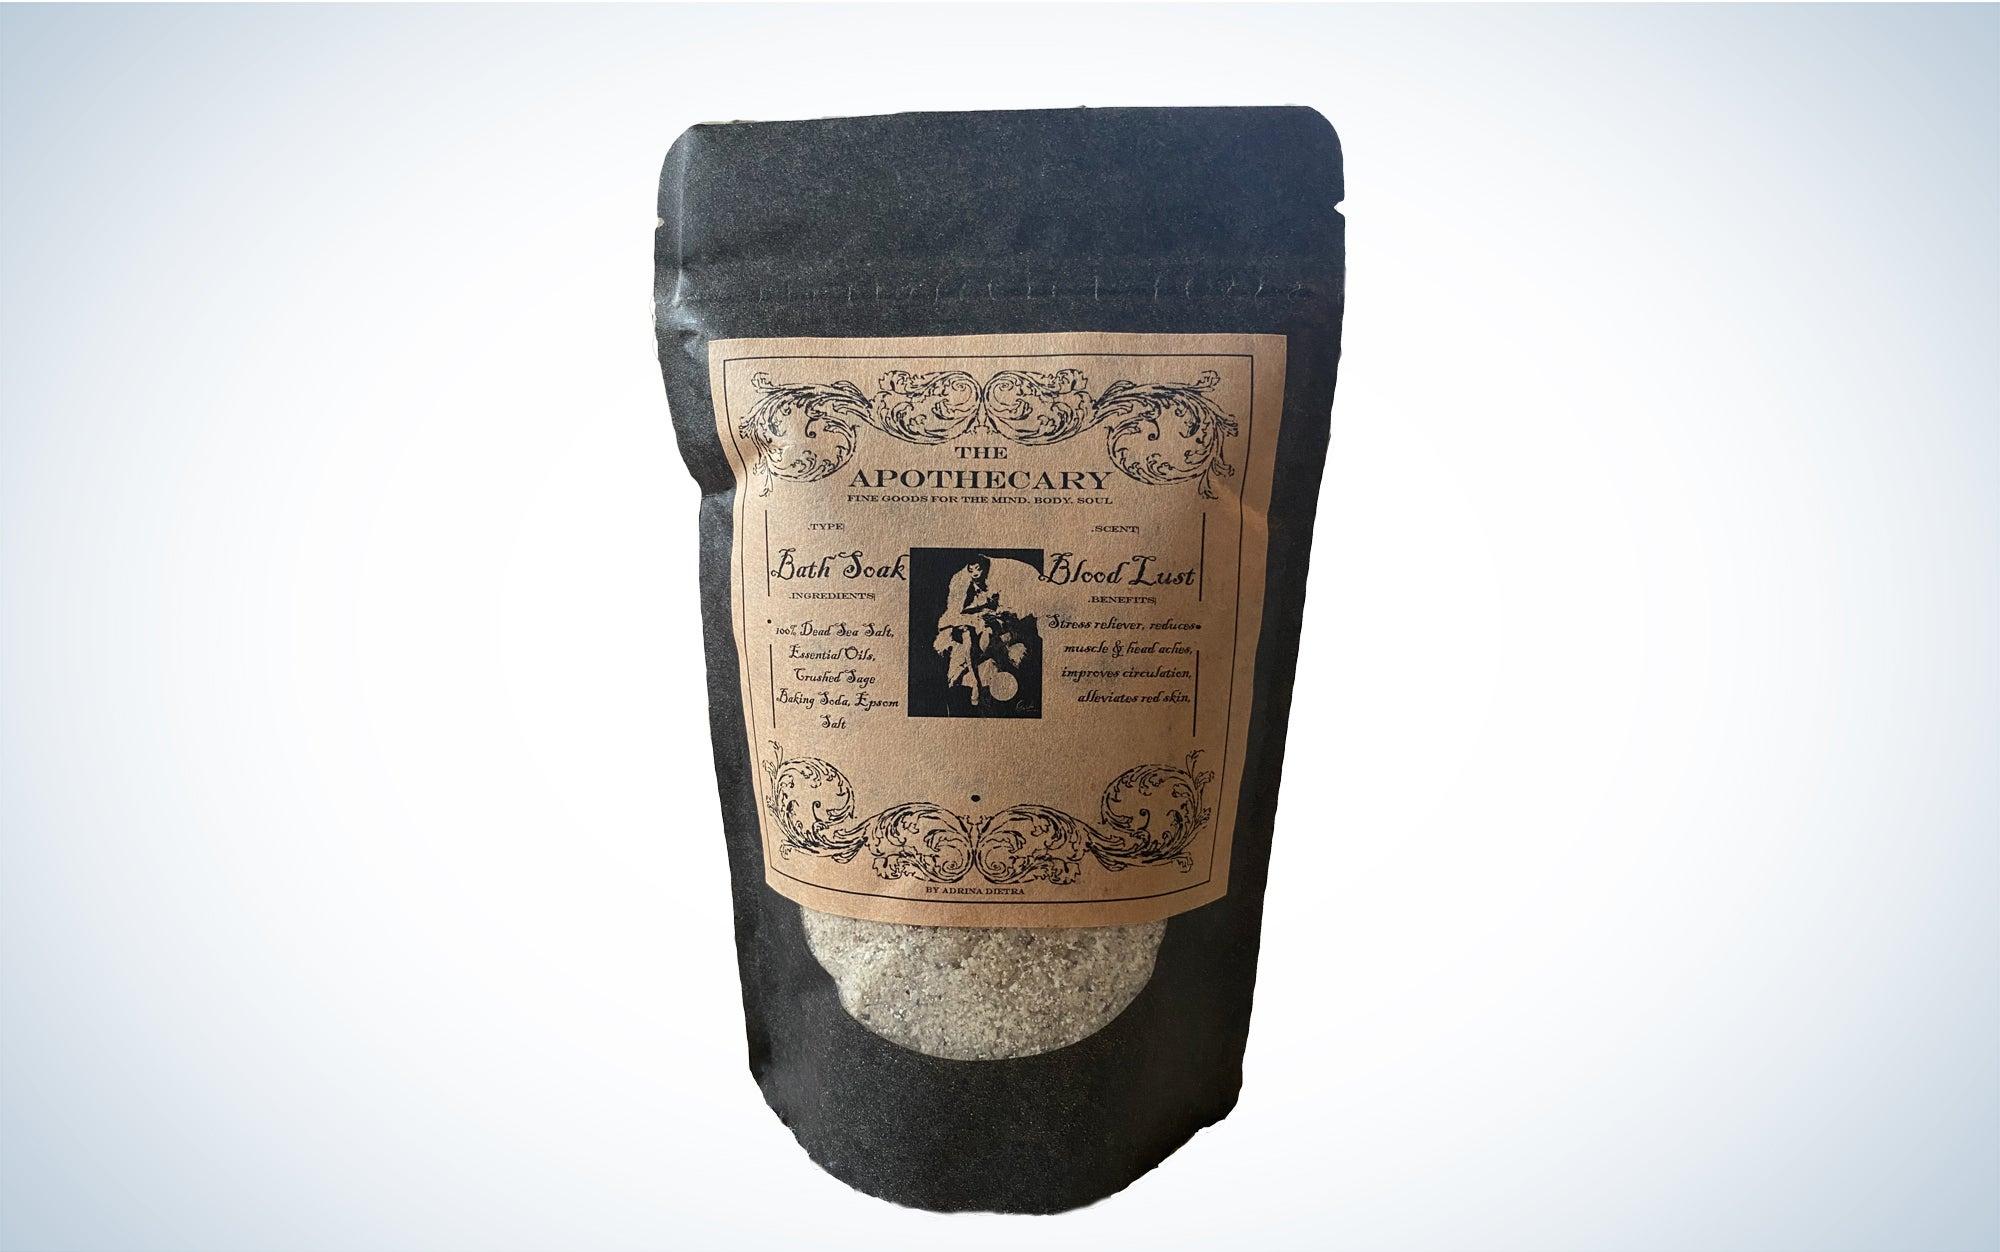 a black and brown bag full of salt